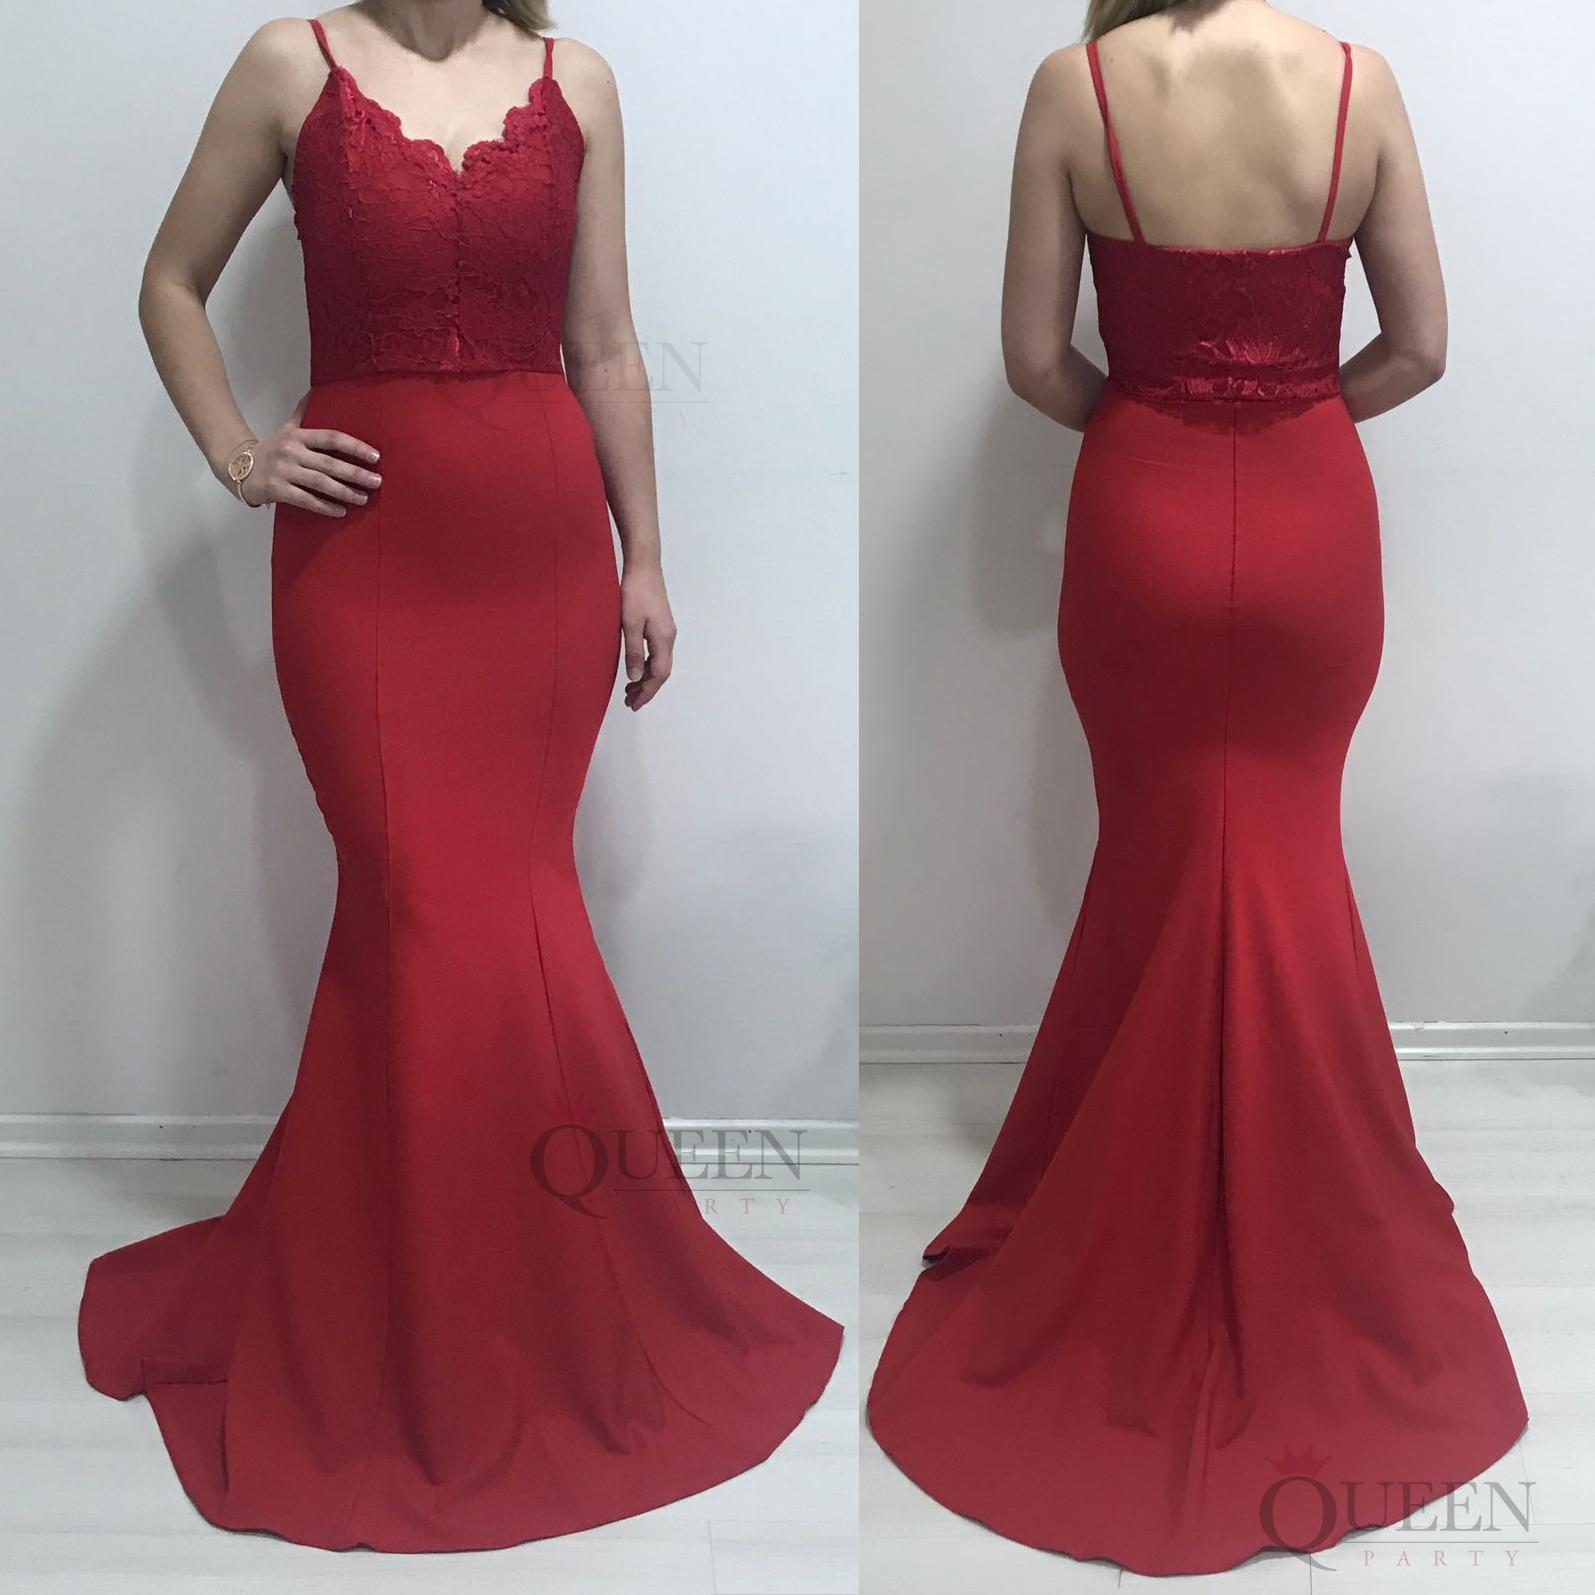 All Red Mermaid Dress